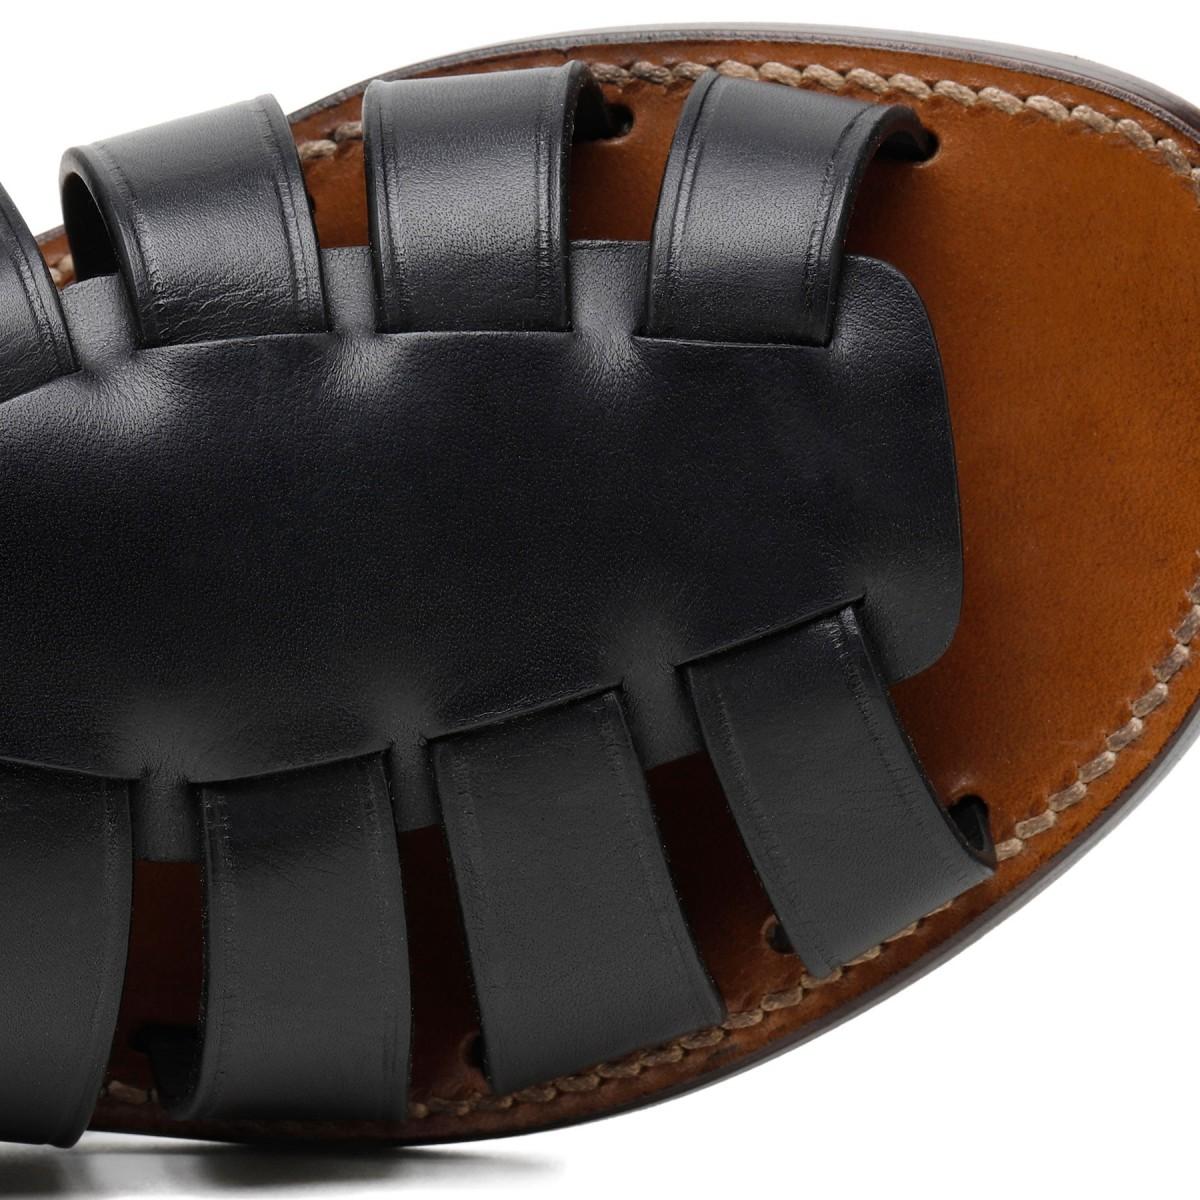 Black leather gladiator sandals